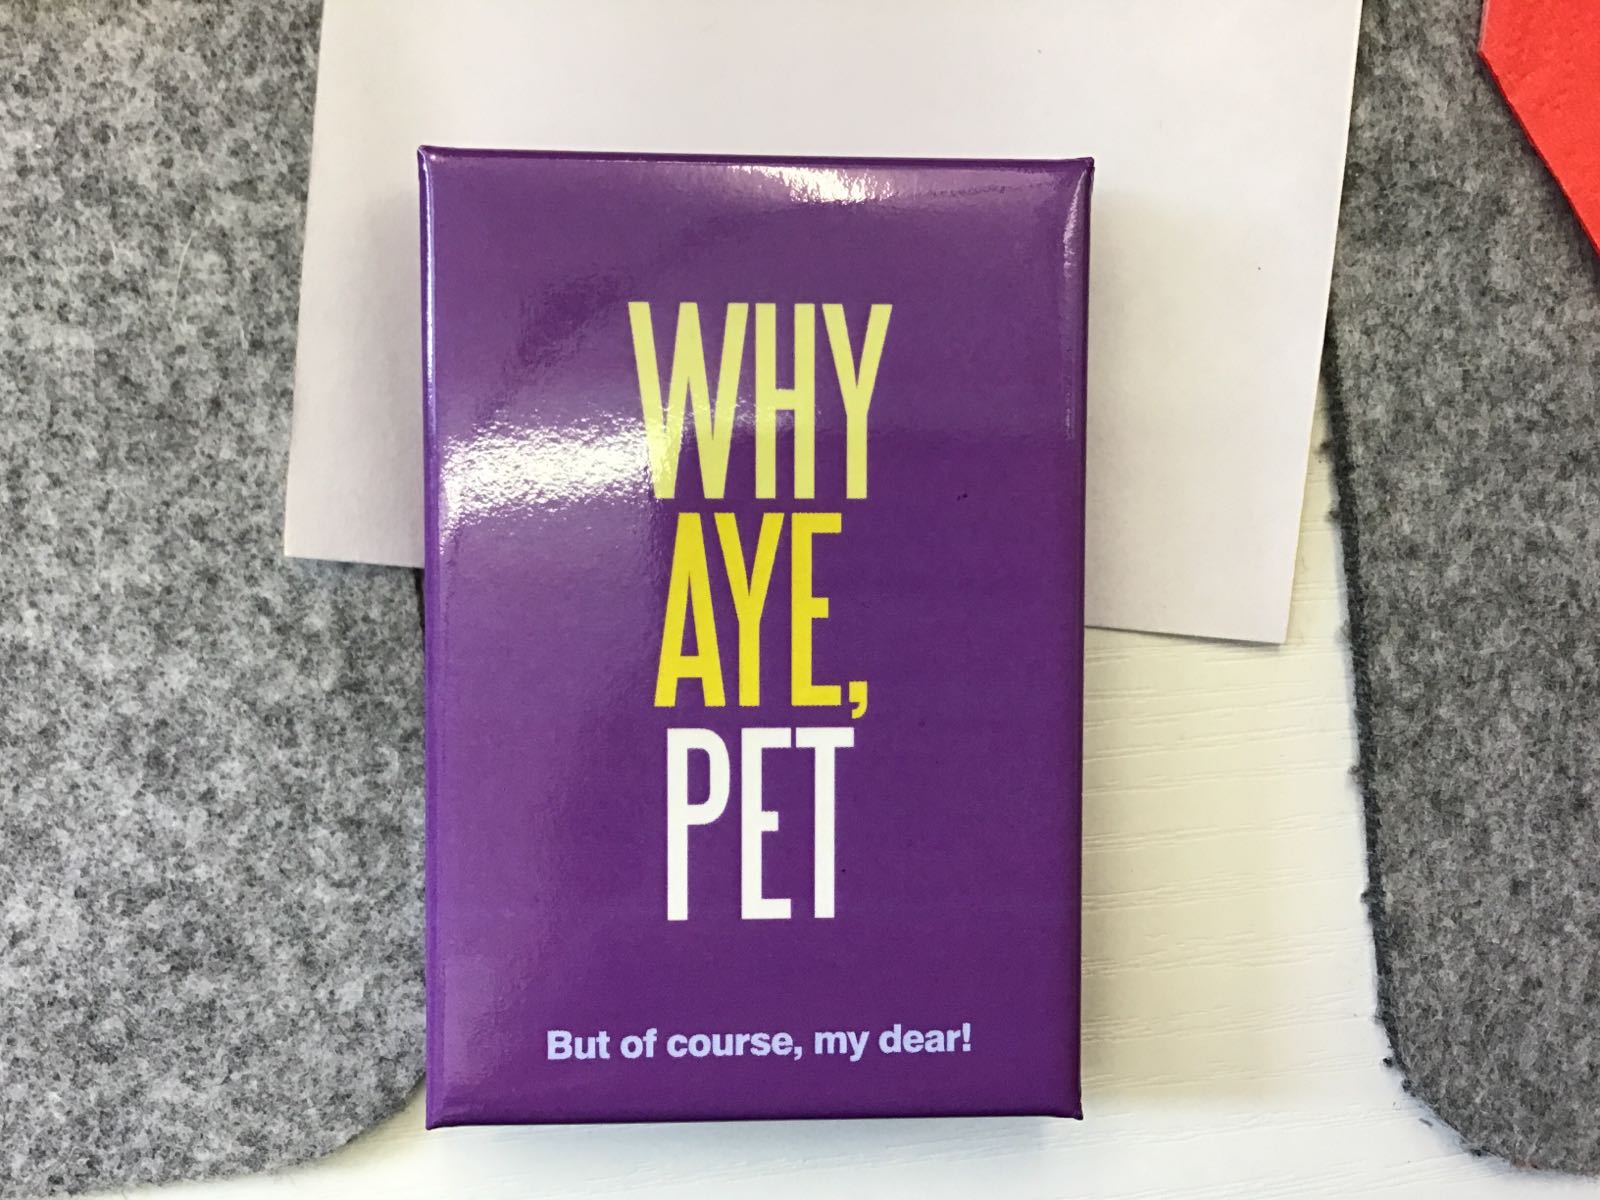 Whey Aye Pet